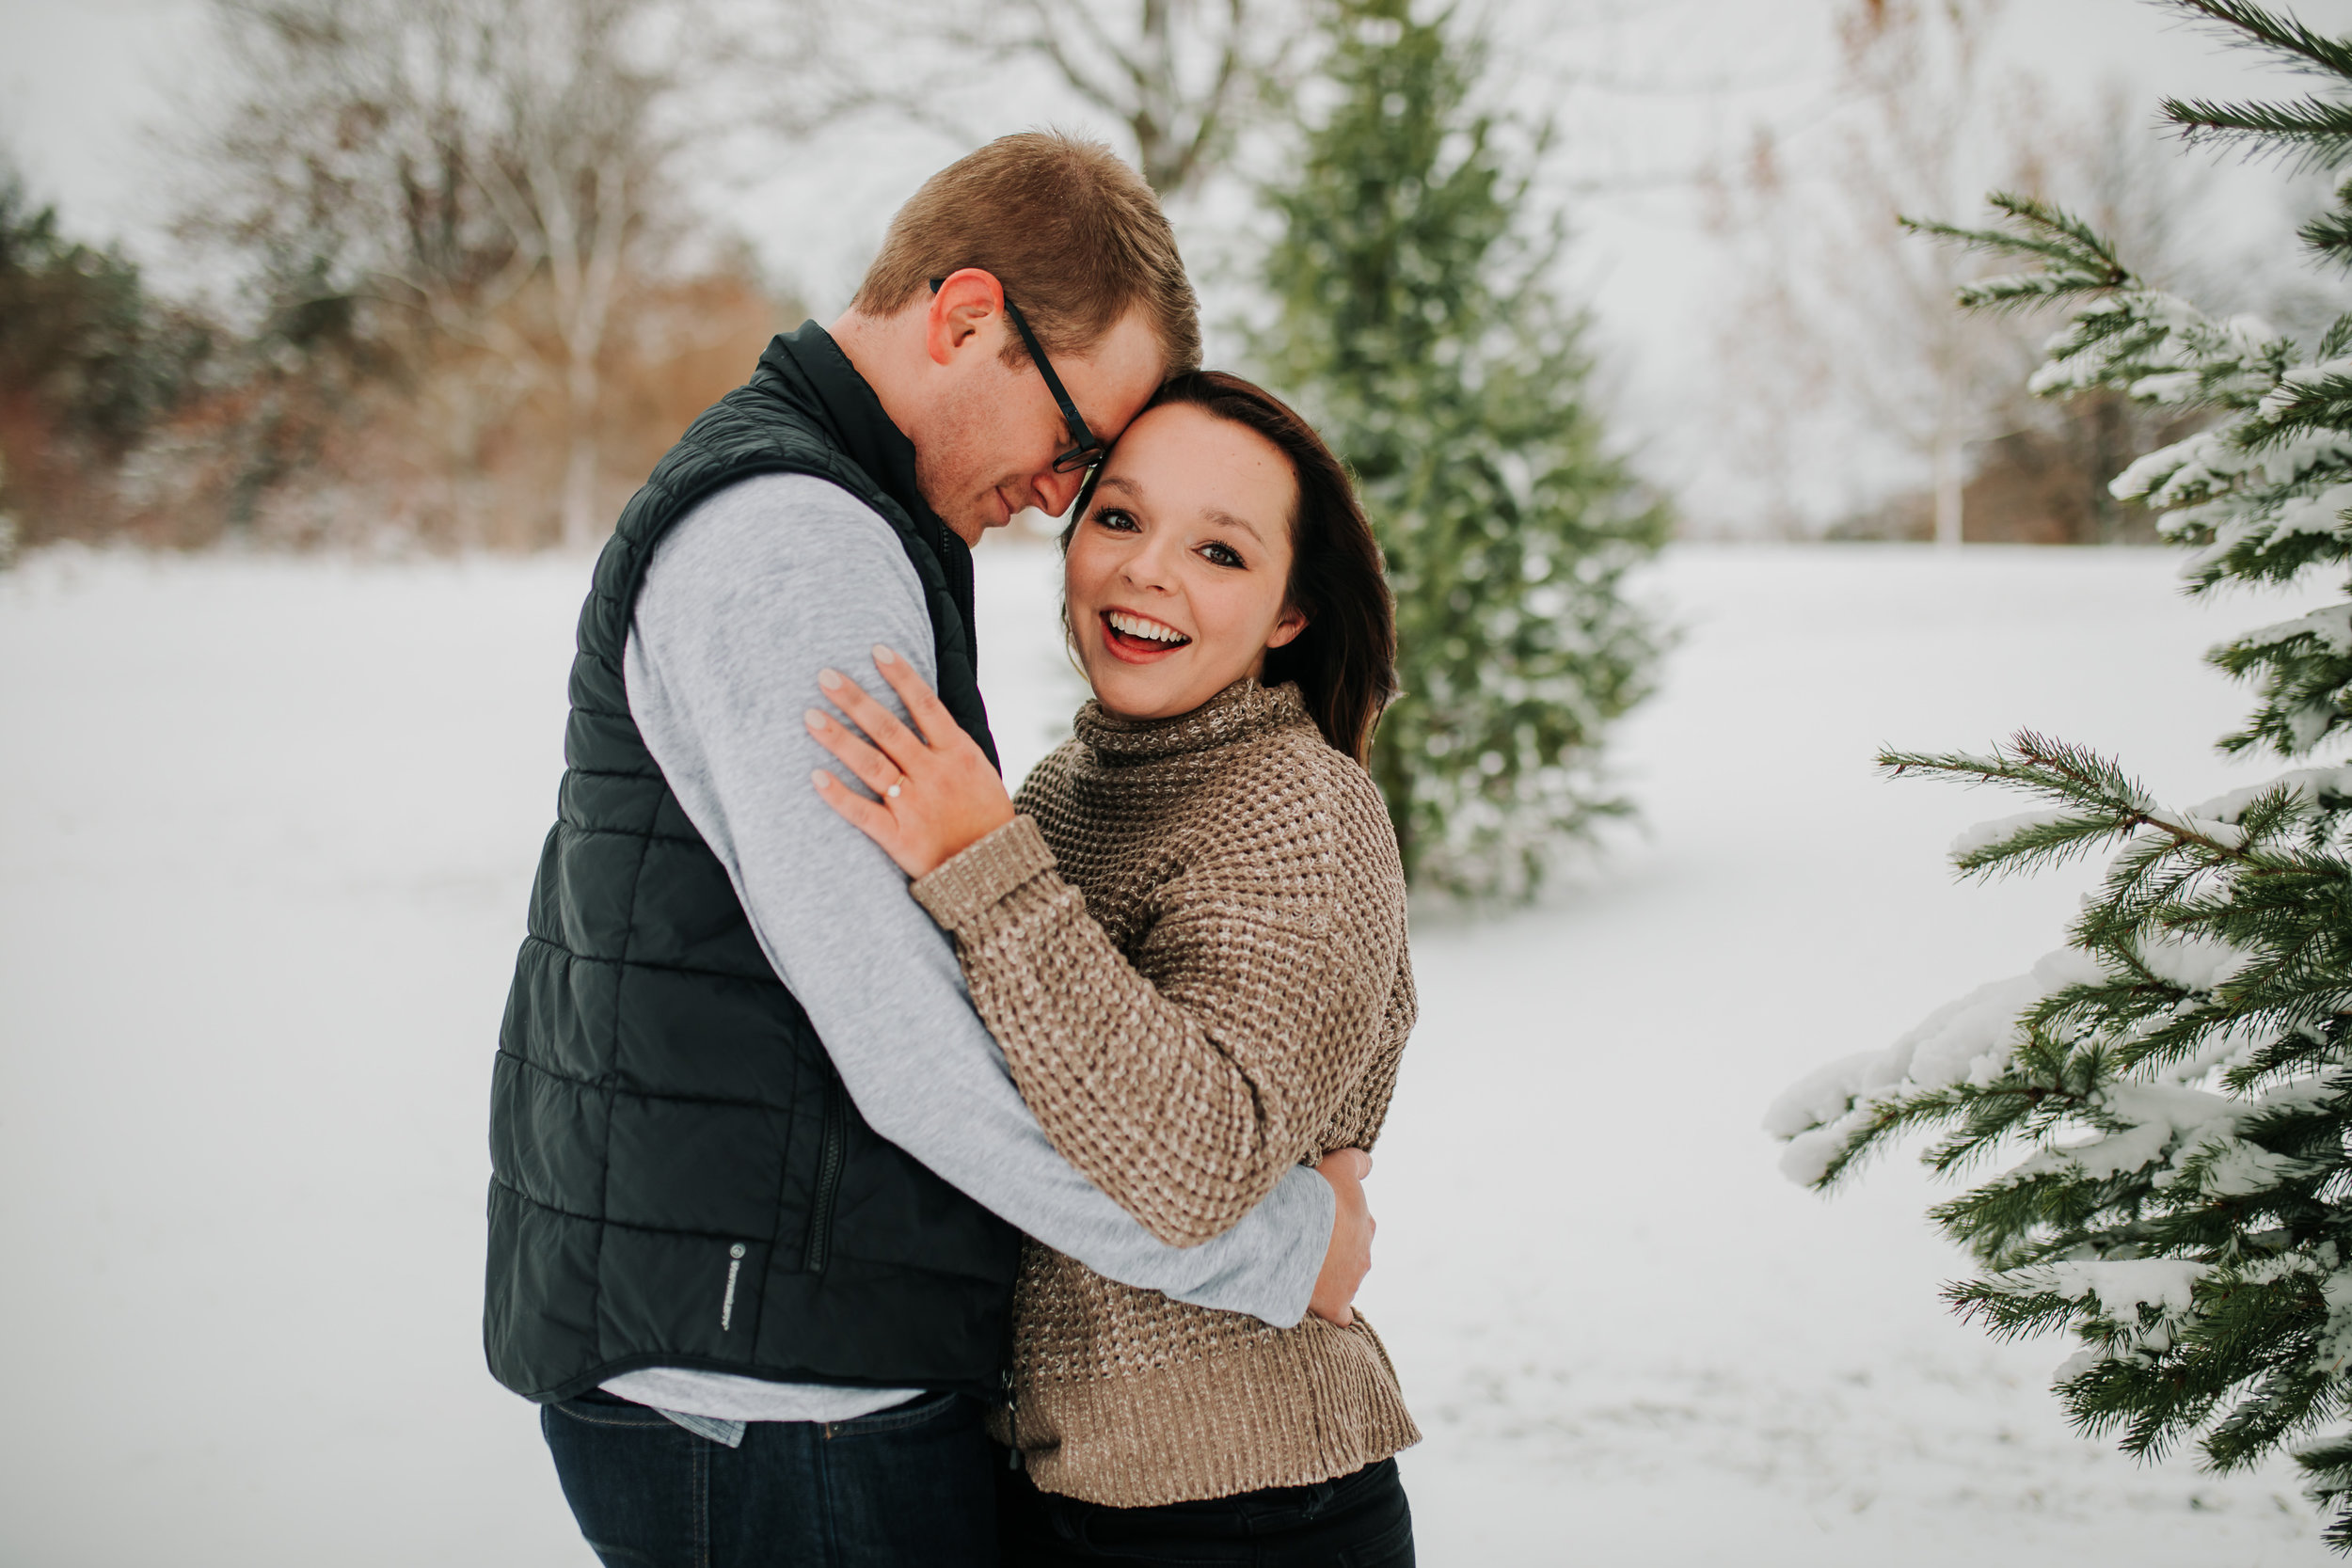 Vanessa & Dan - Engaged - Nathaniel Jensen Photography - Omaha Nebraska Wedding Photographer - Standing Bear Lake - Snowy Engagement Session-50.jpg